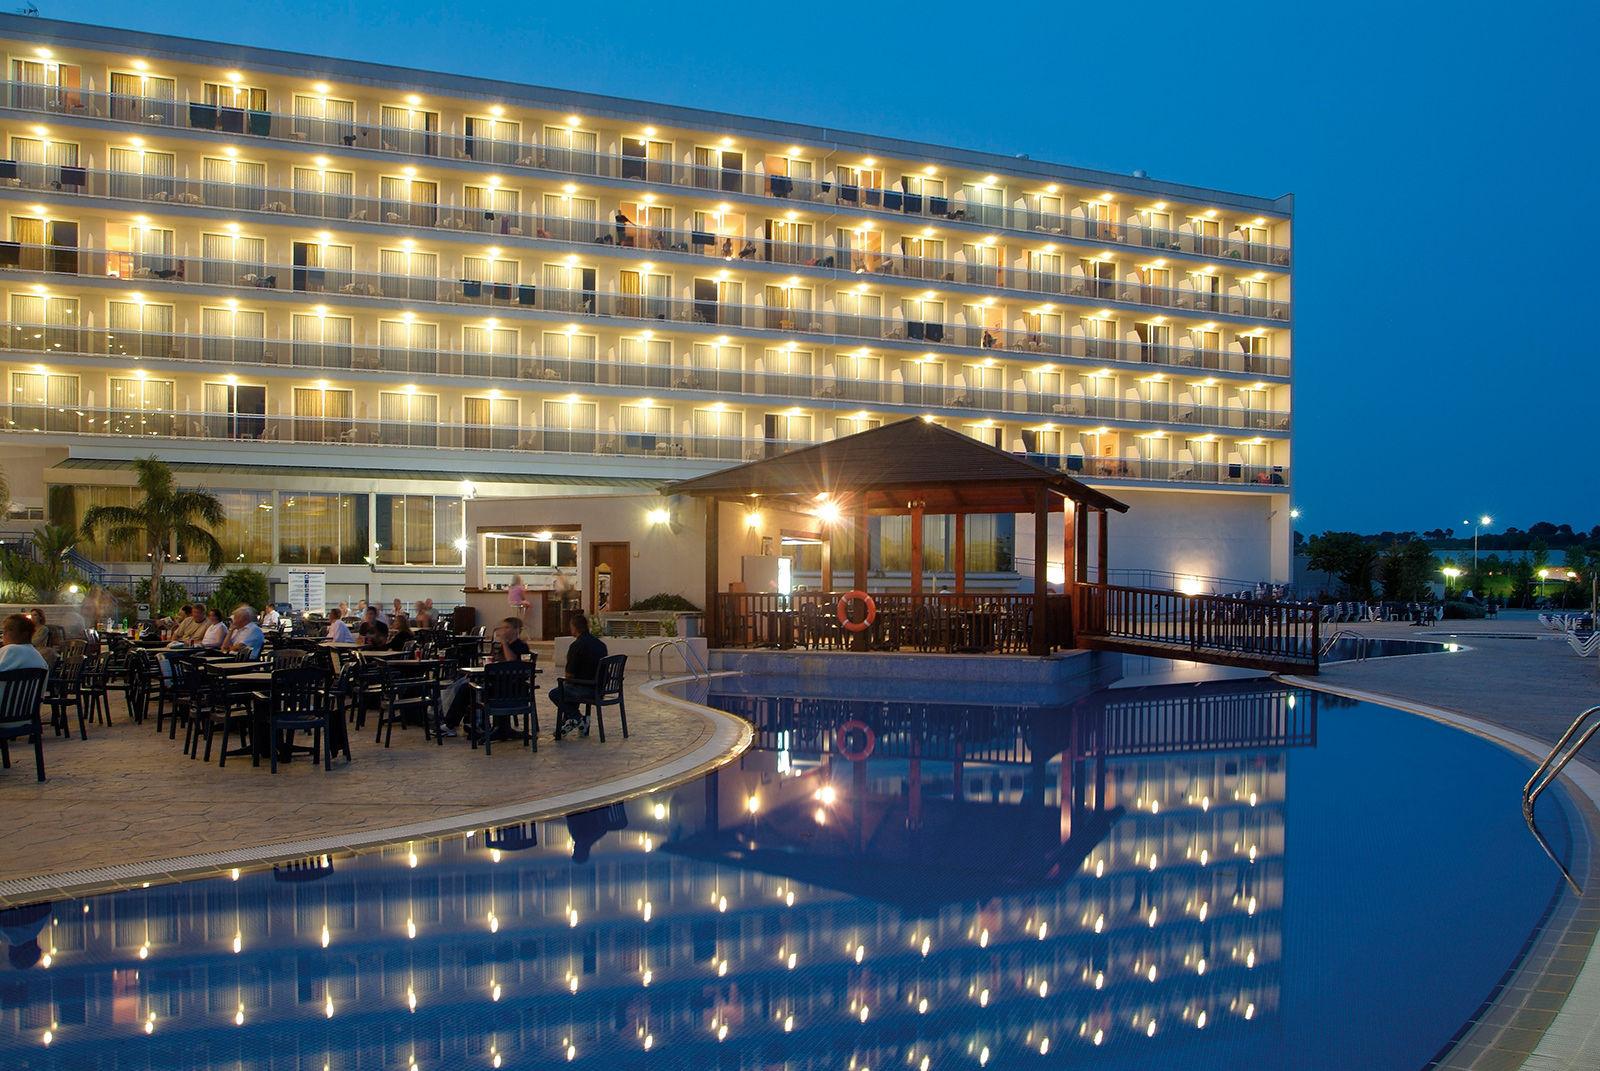 Hôtel Sol Costa Daurada 4*NL